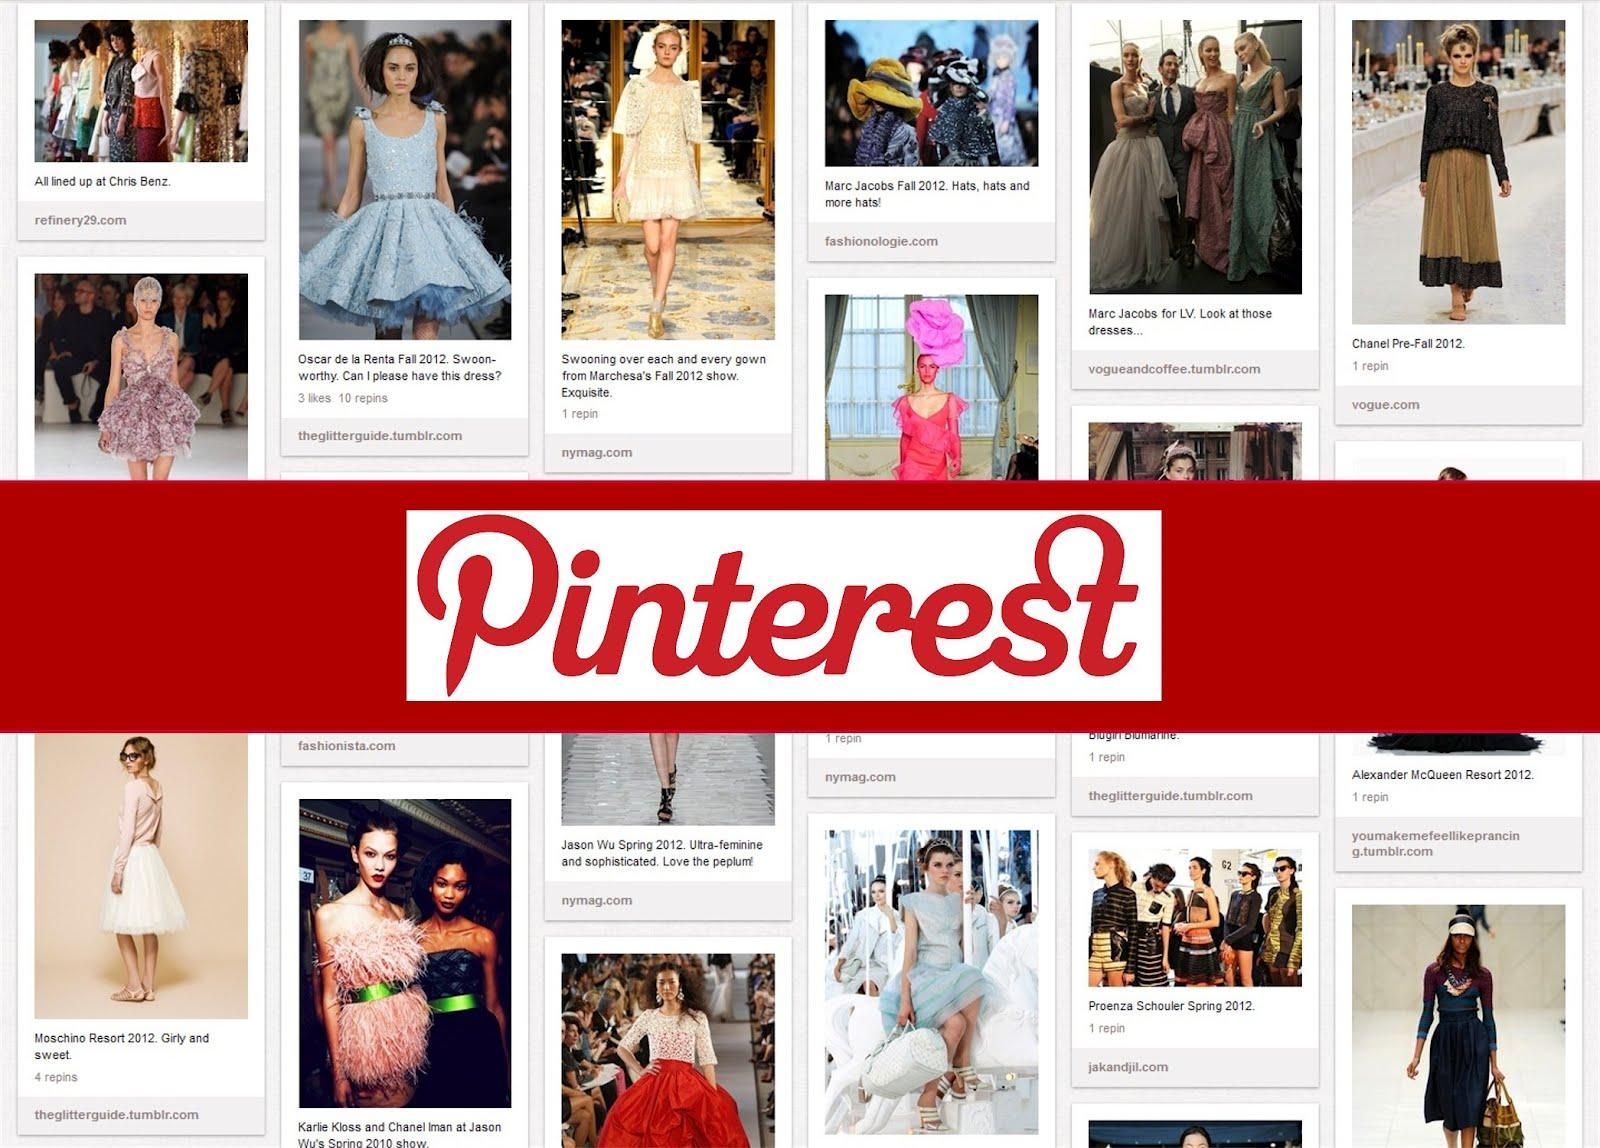 Pinterest: 10 Fashion & Beauty Pinterest Accounts To Follow